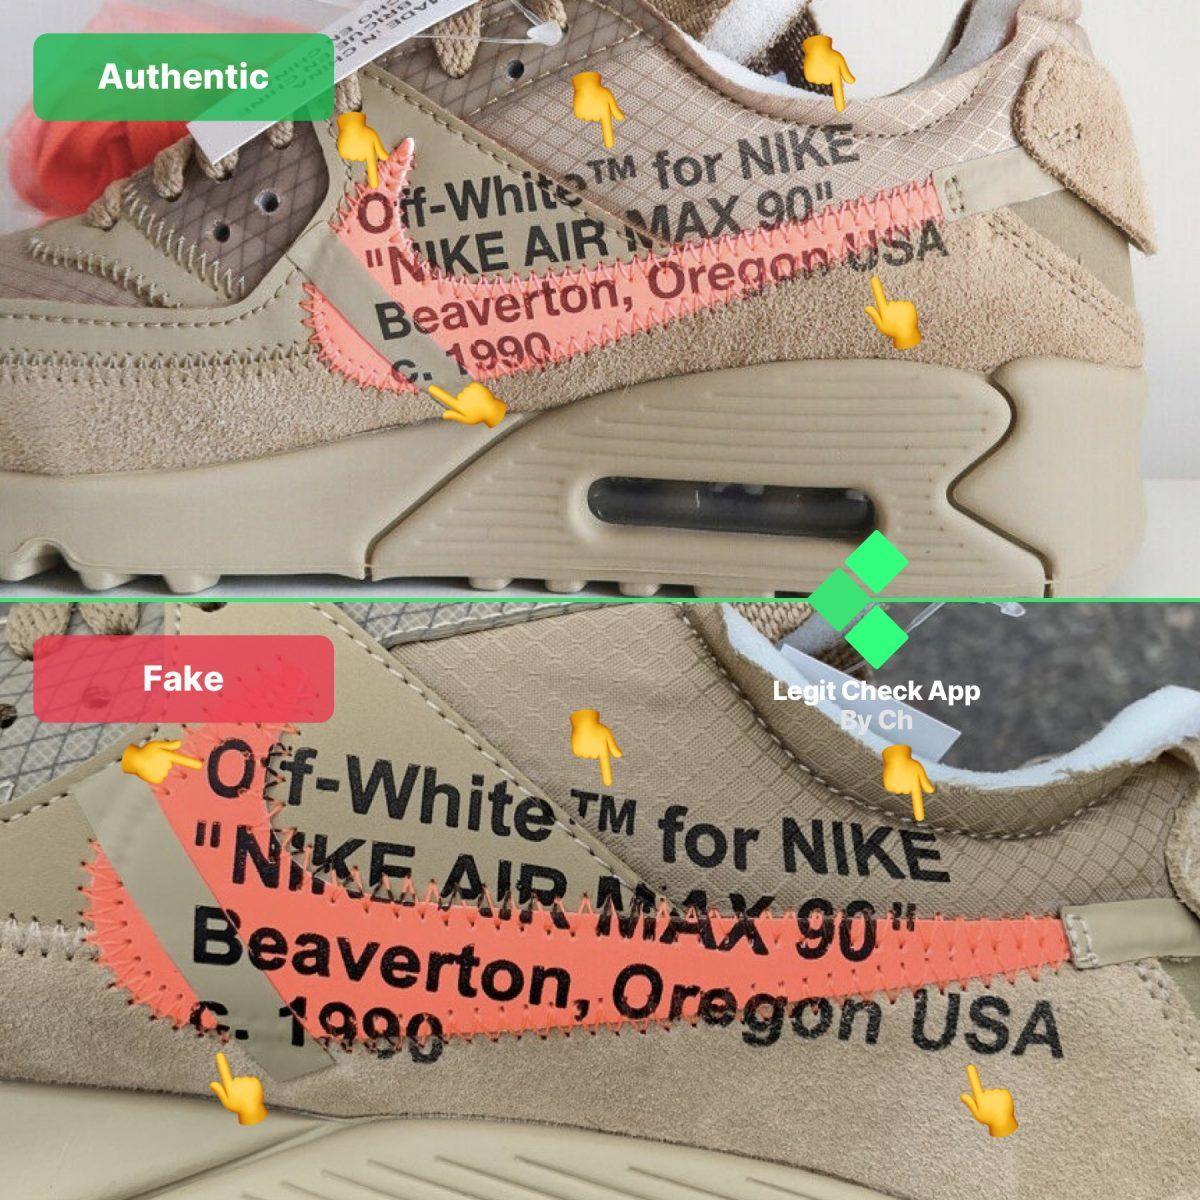 Off-White Air Max 90 Desert Ore